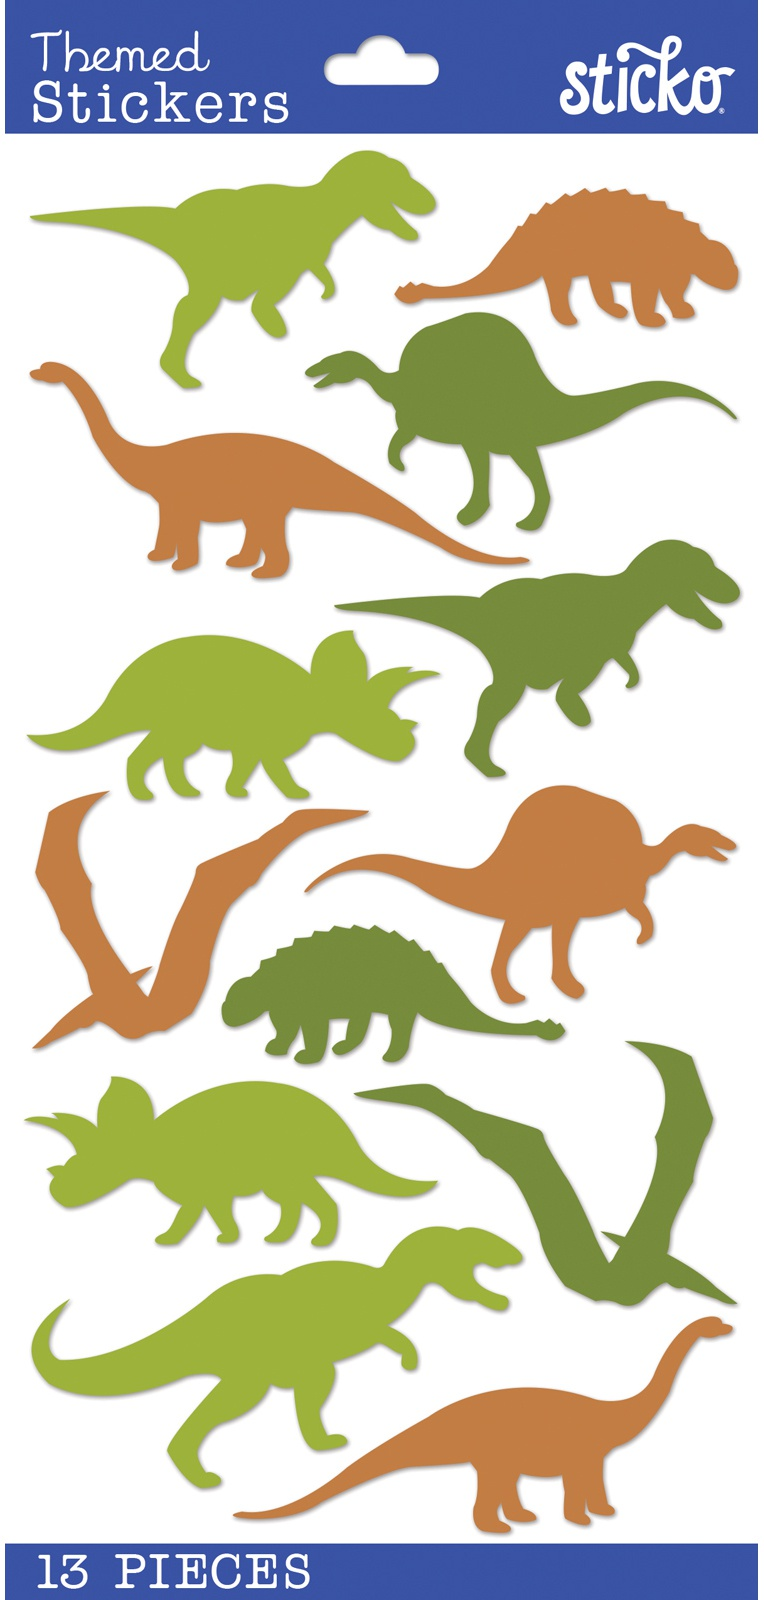 Sticko Tiny Stickers-Dinosaur Silhouettes